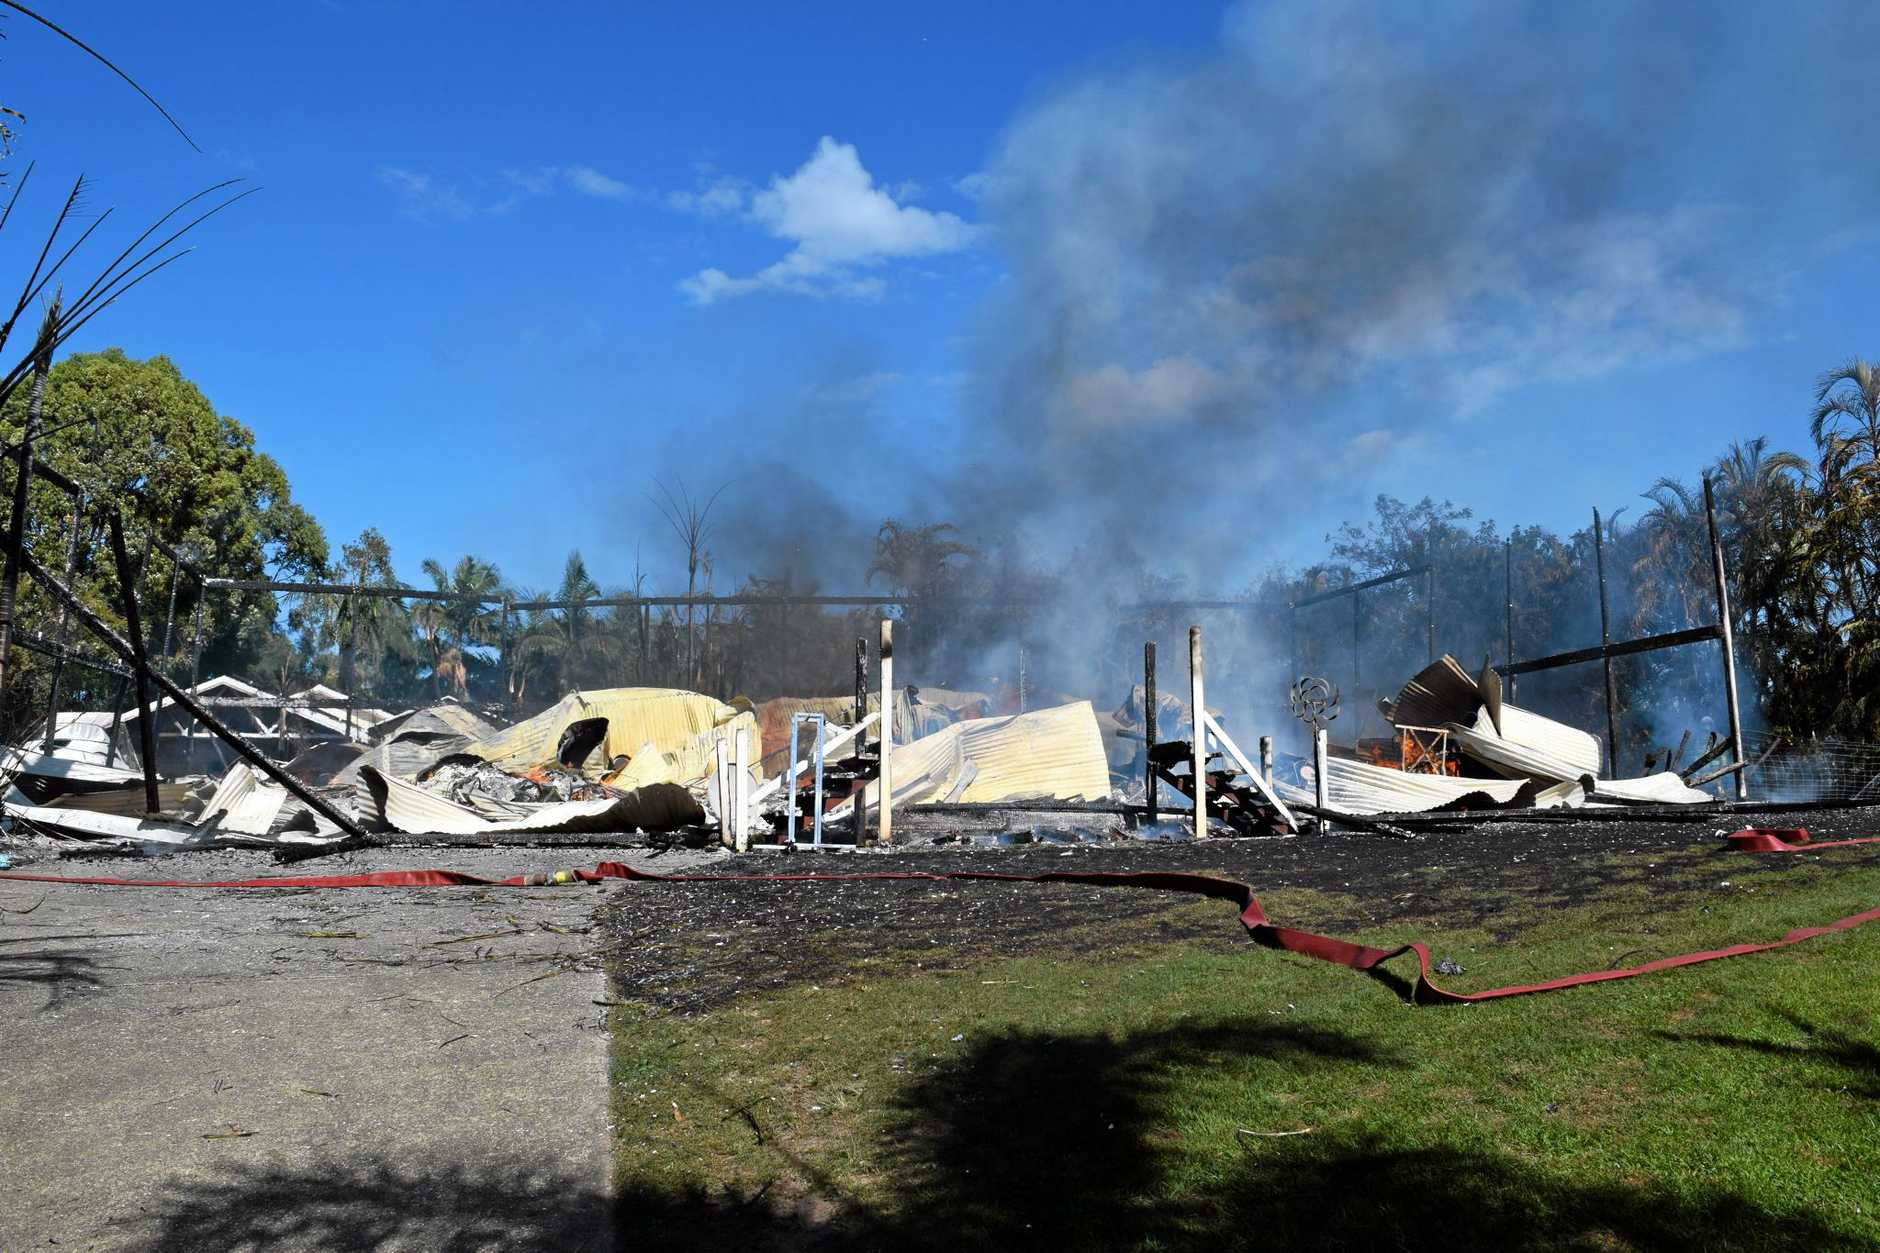 SMOULDERING: A house fire demolished a Queenslander at Peregian.